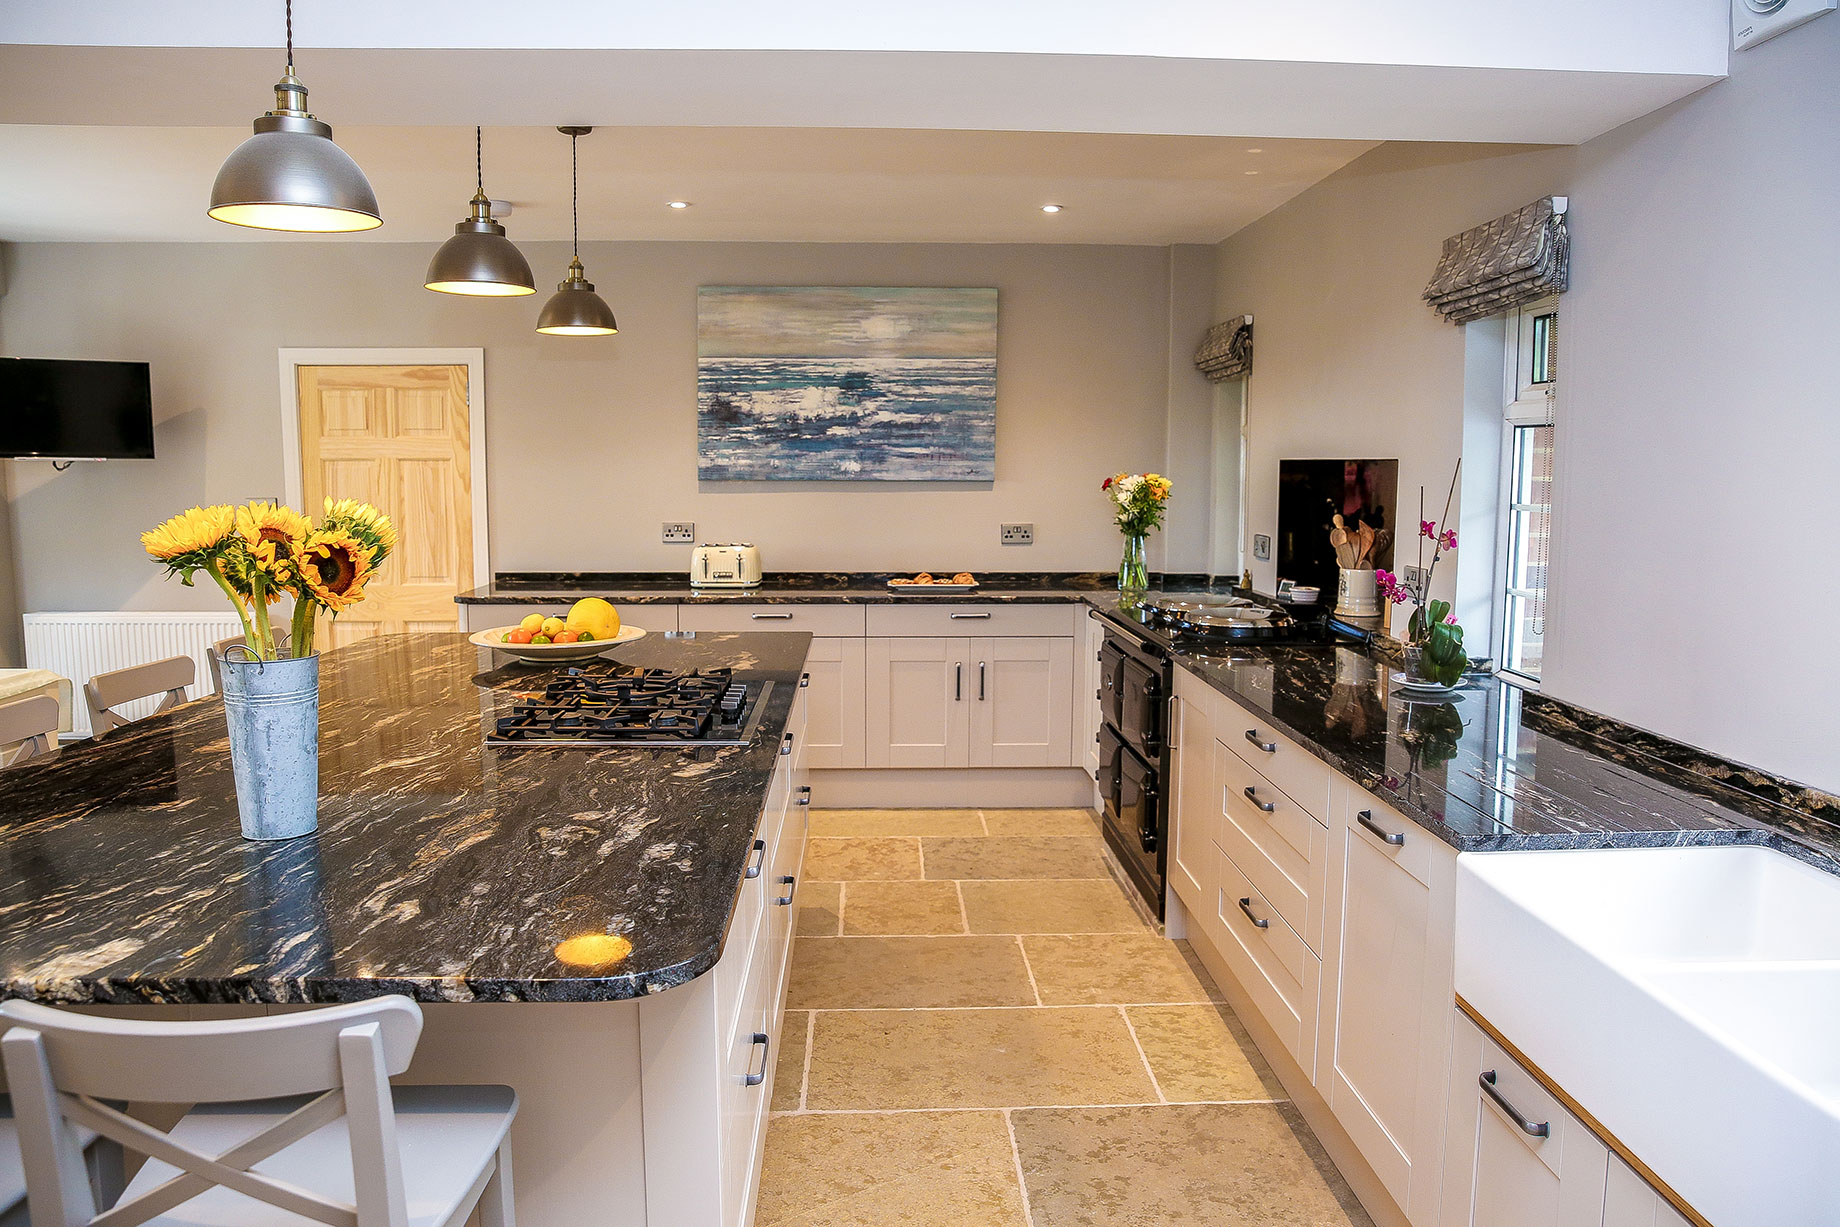 cashmere-painted-mackintosh-kitchen